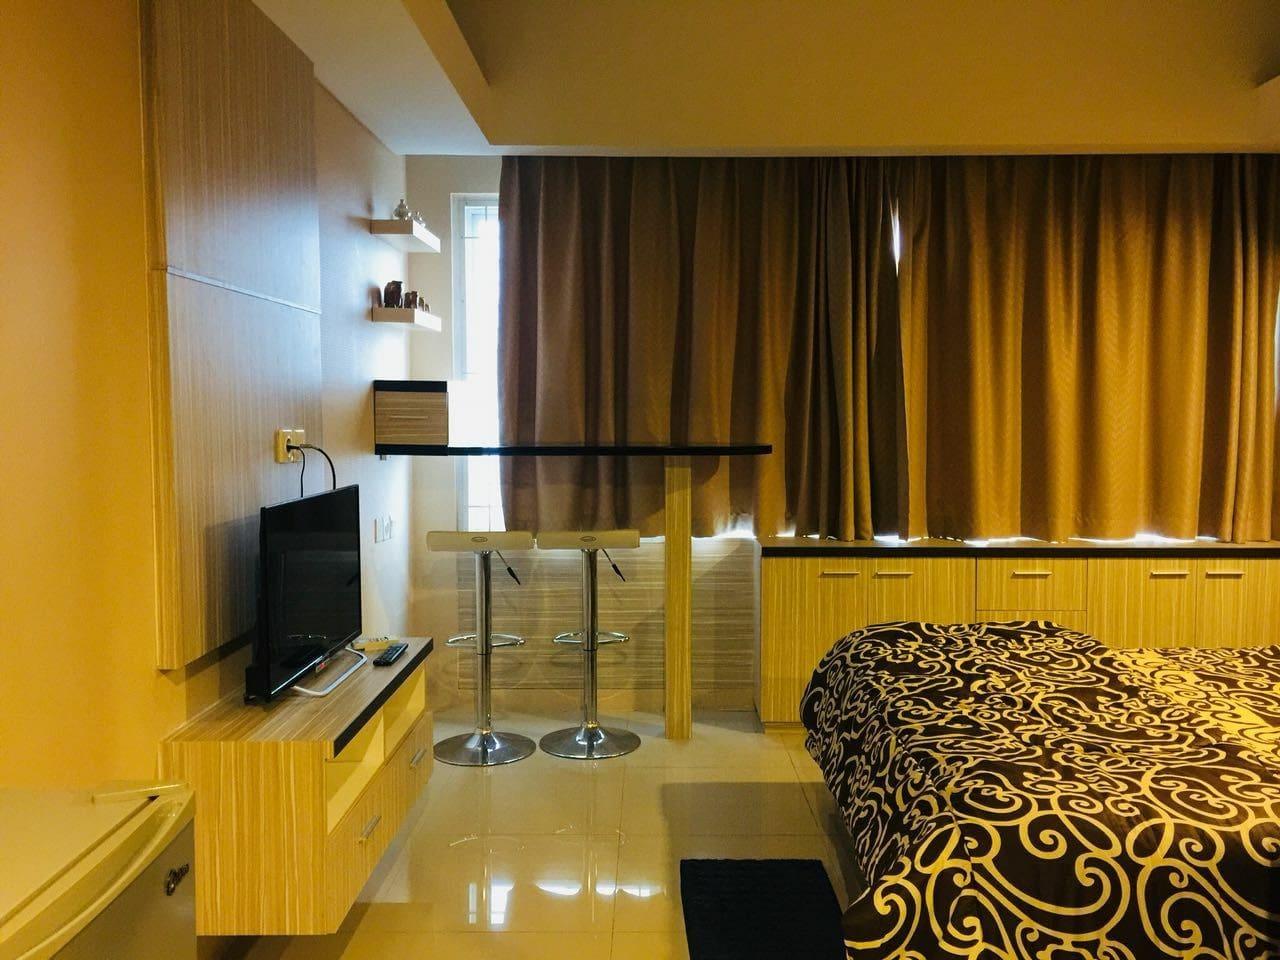 Sewa Apartemen Bogor Harian Bulanan Appartements Louer Bogor